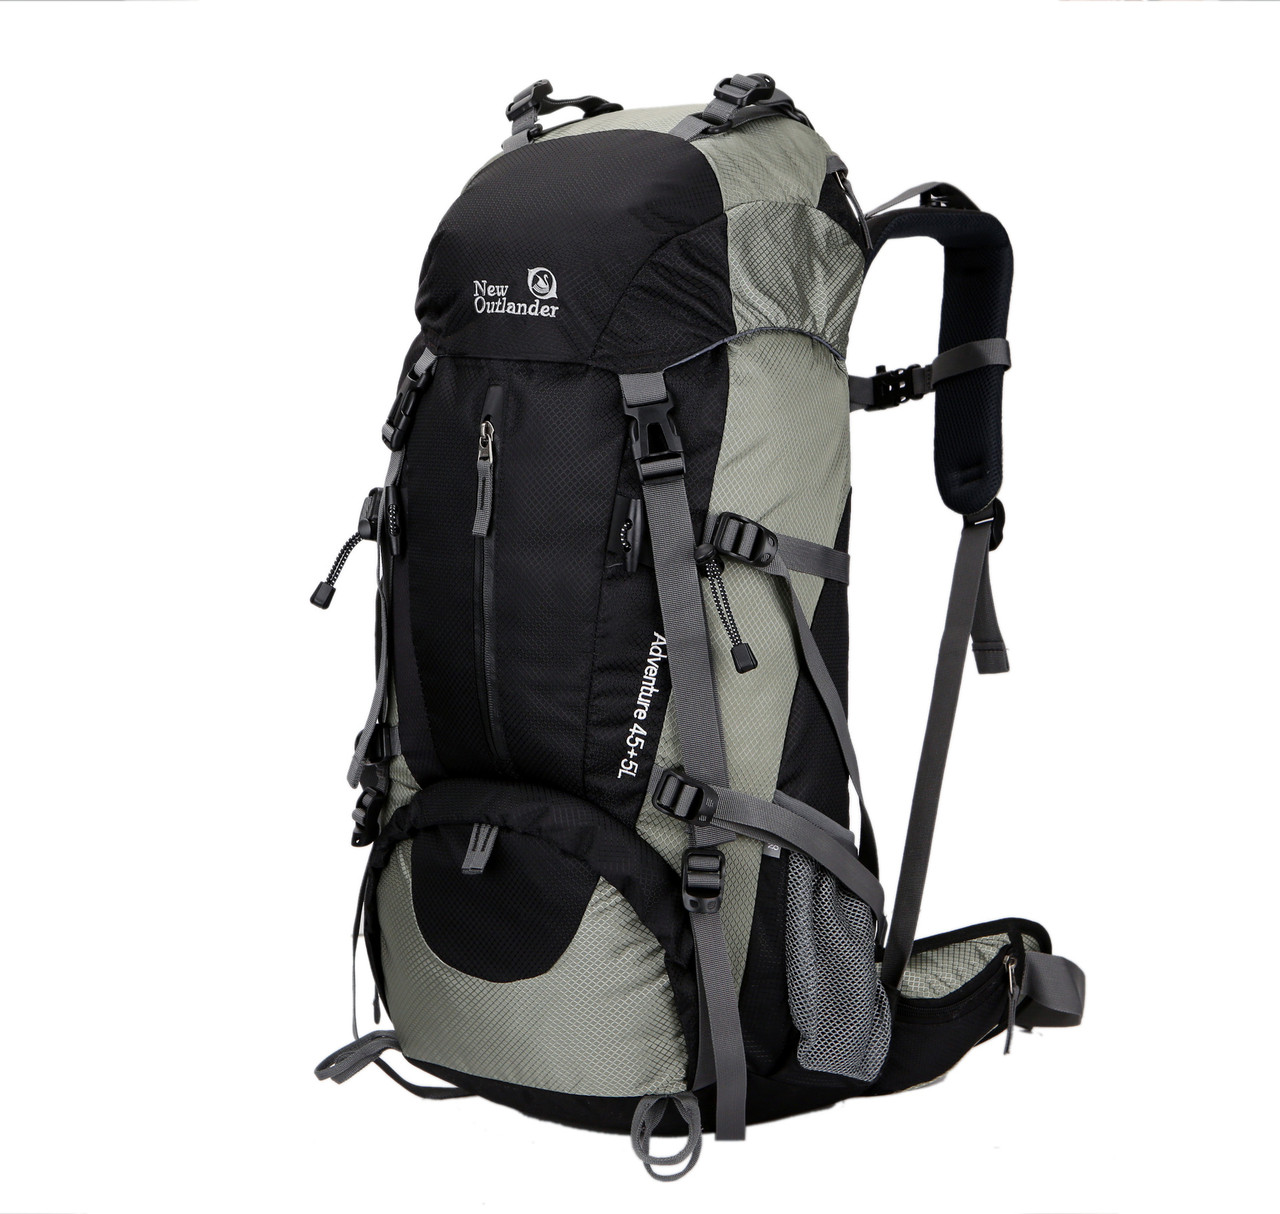 Туристический рюкзак New Outlander Adventure 55+5 л - фото 3